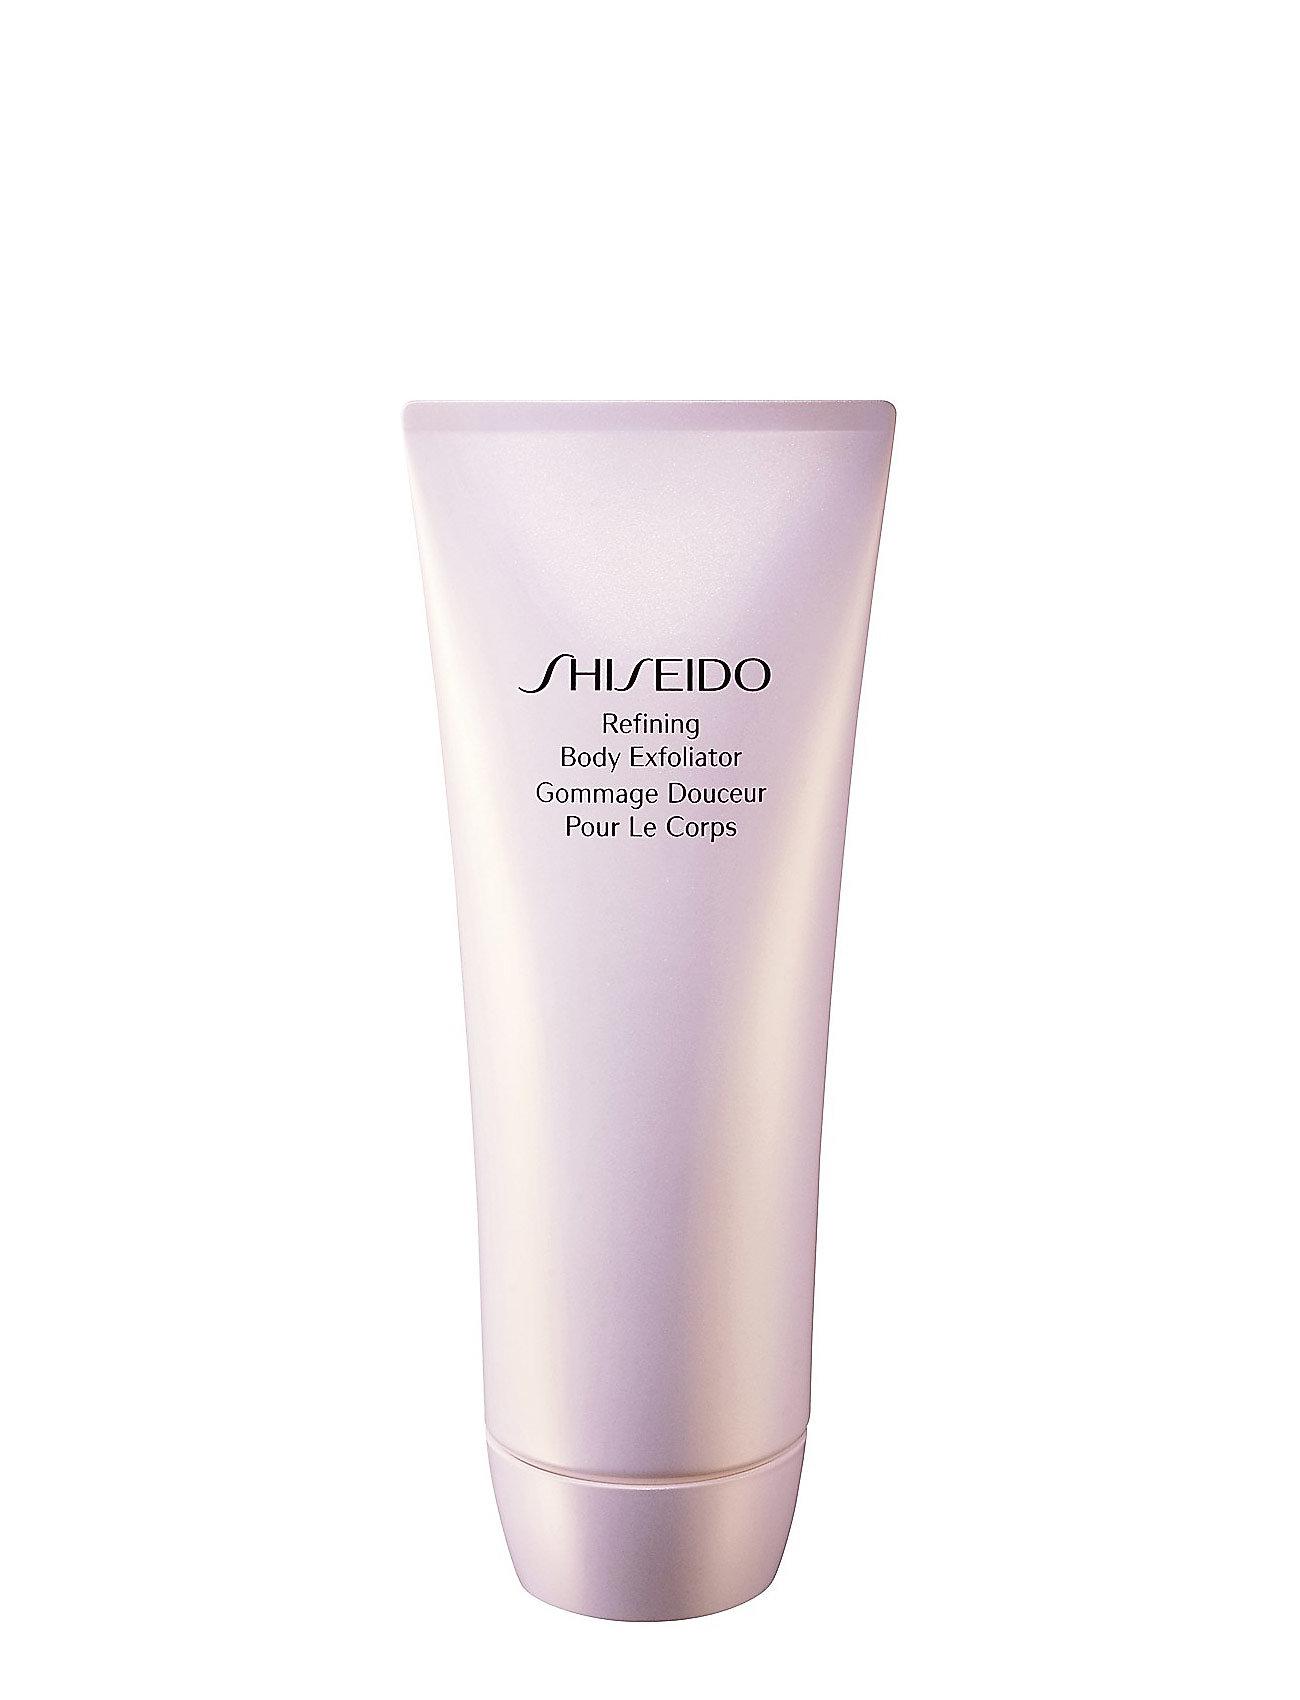 Image of Bodycare Refining Body Exfoliator Serum Ansigtspleje Nude Shiseido (3281588781)